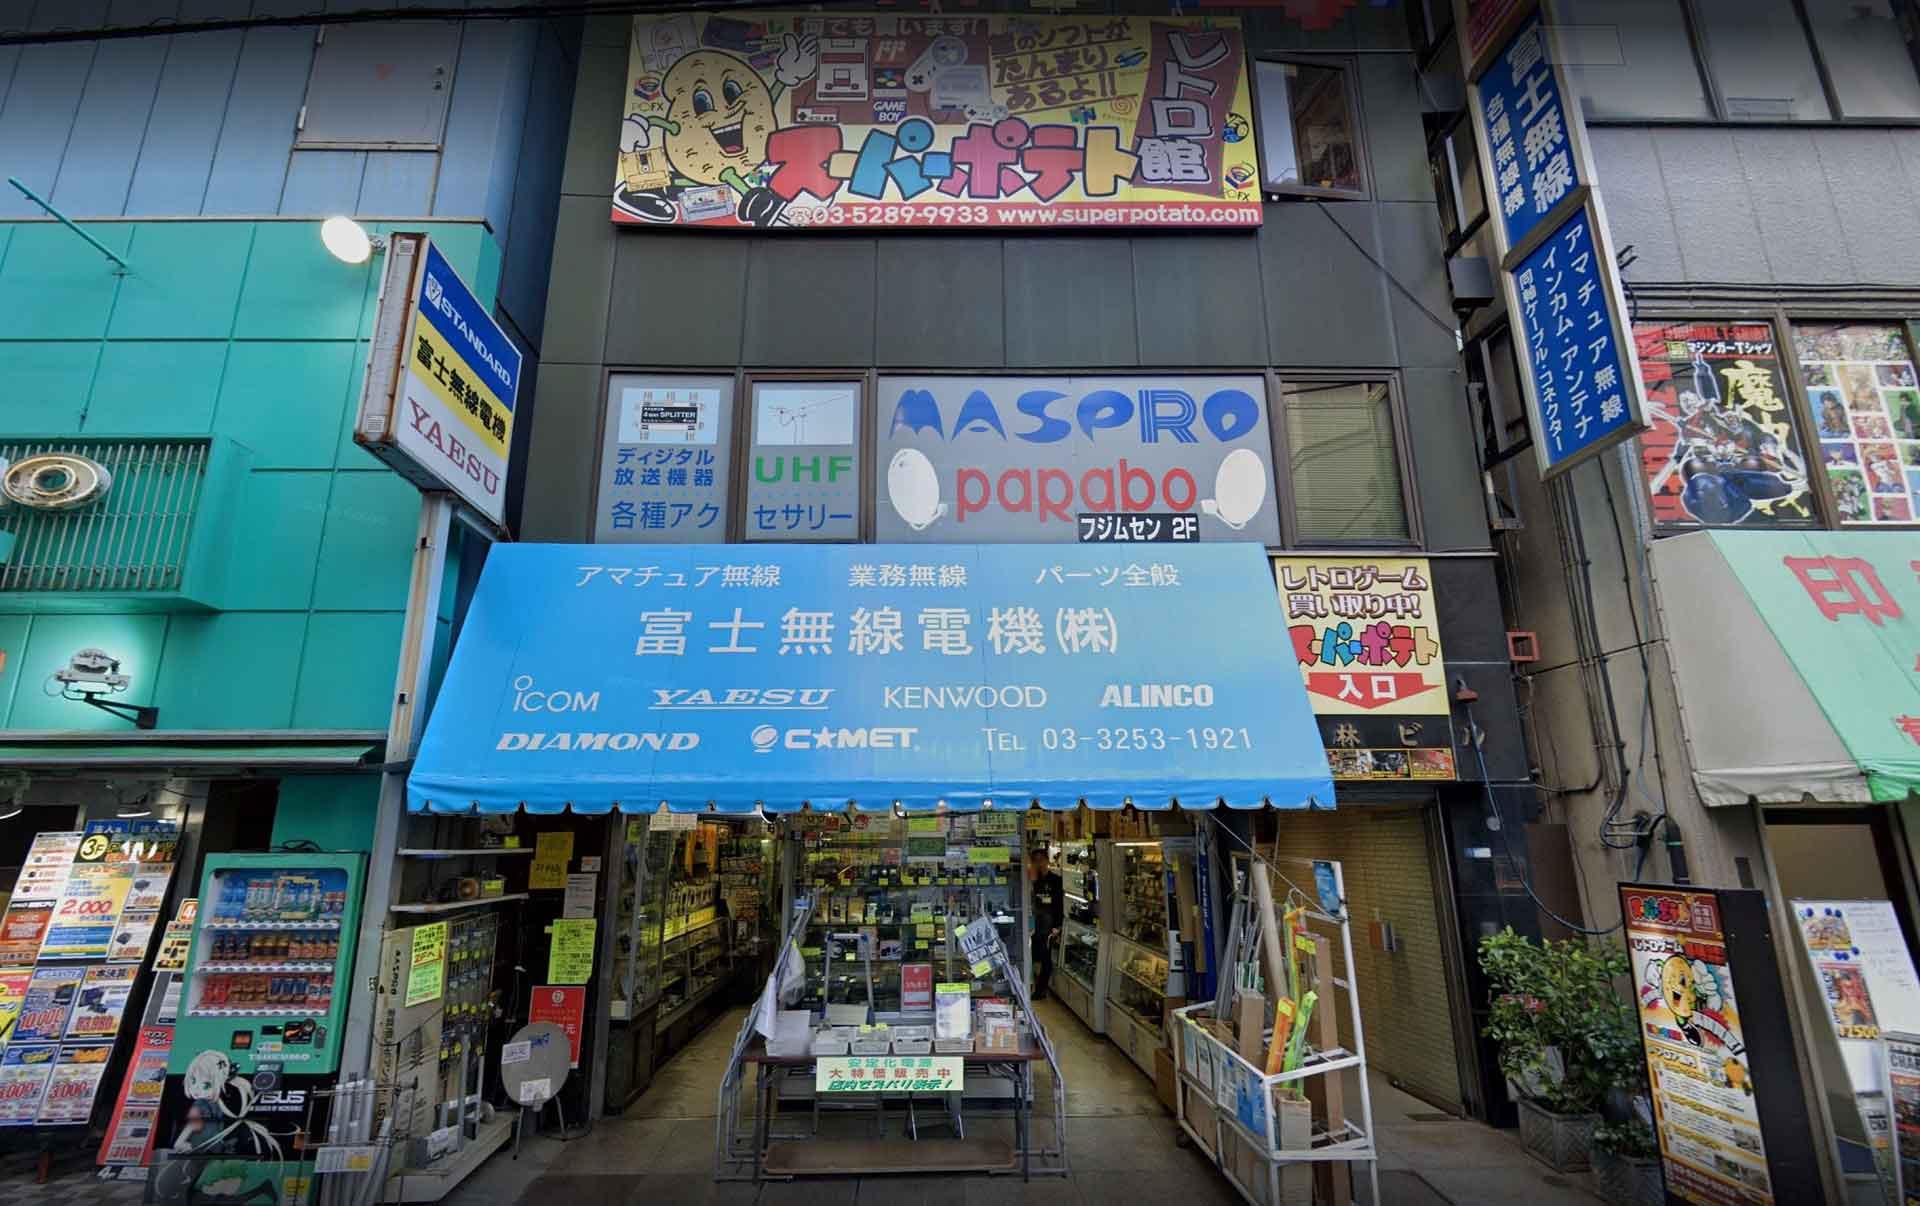 Super Potato: Japans legendärer Games Store eröffnet internationalen Ebay-Shop